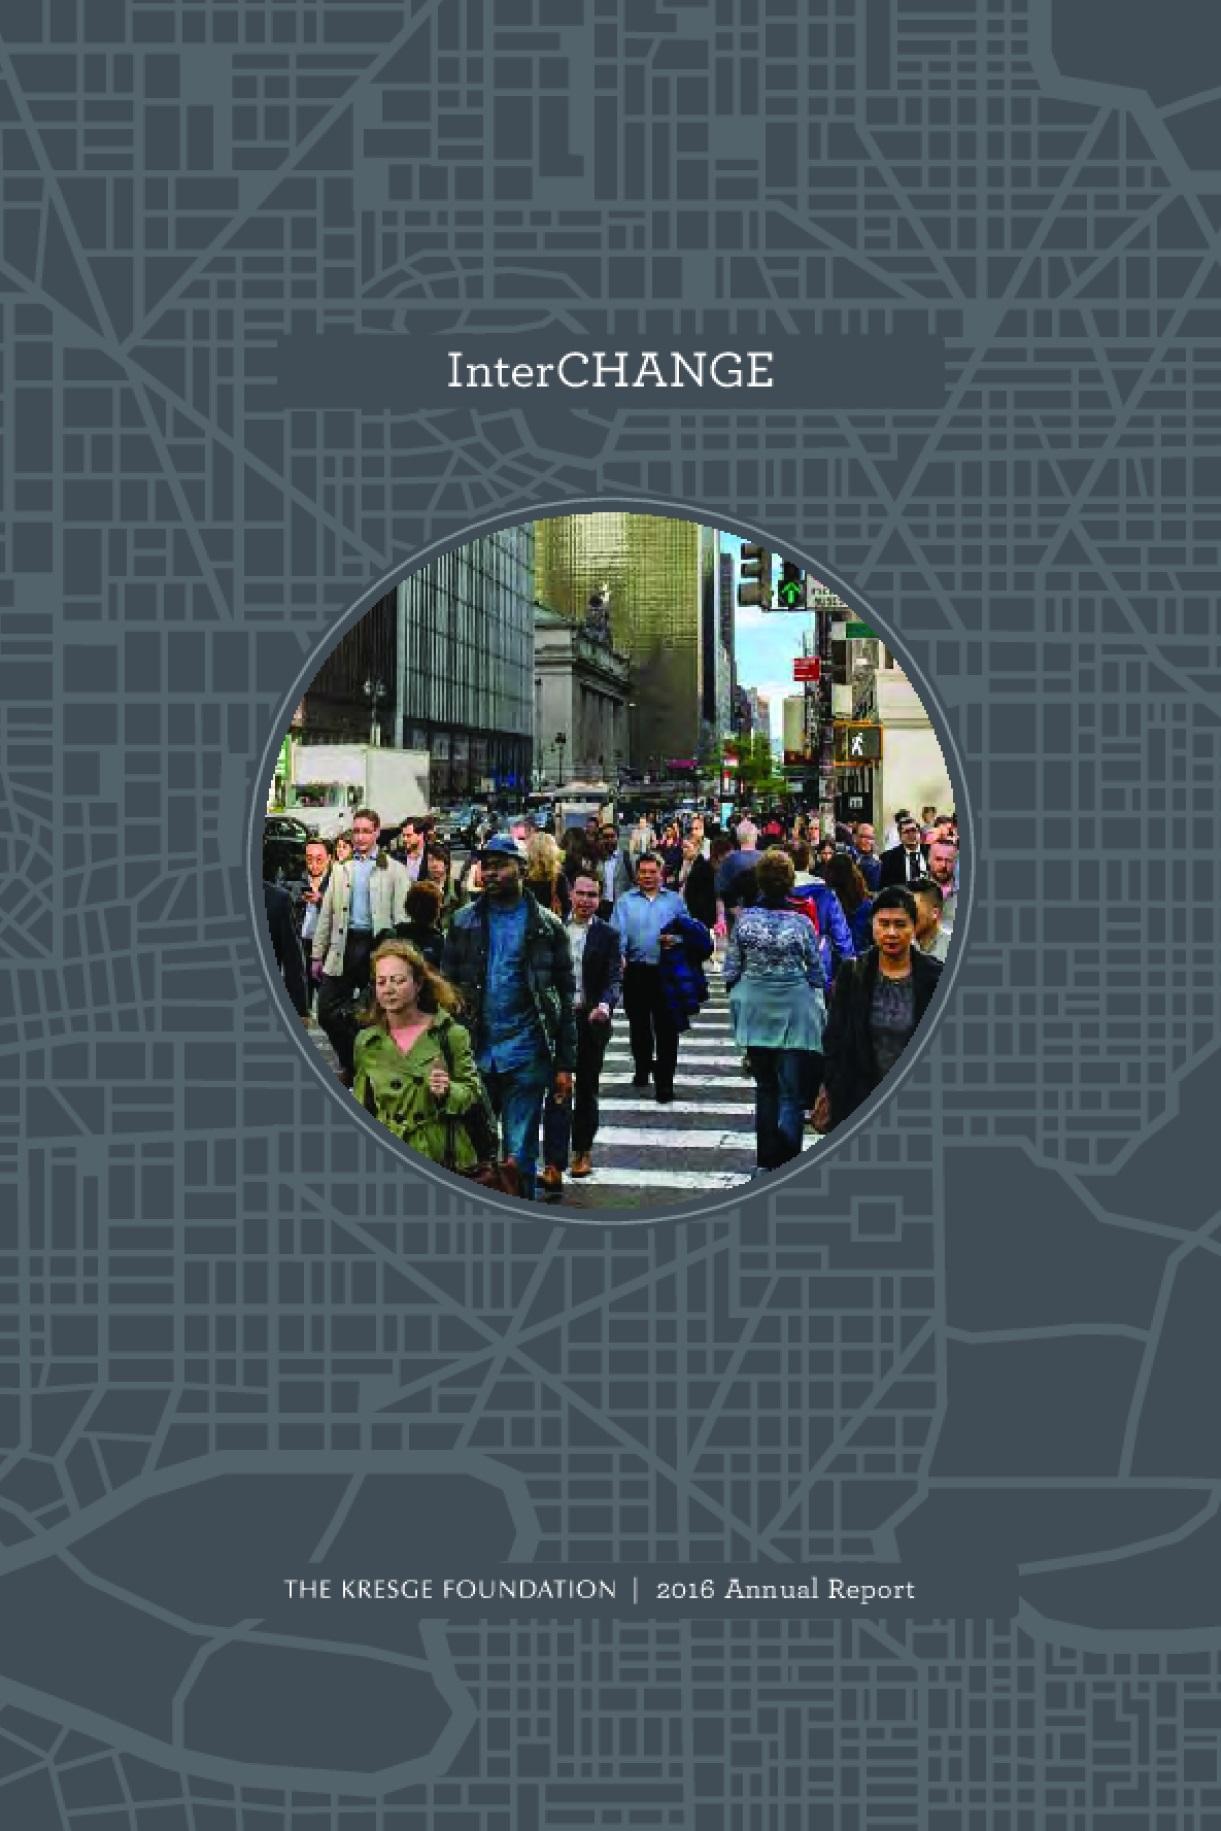 The Kresge Foundation 2016 Annual Report